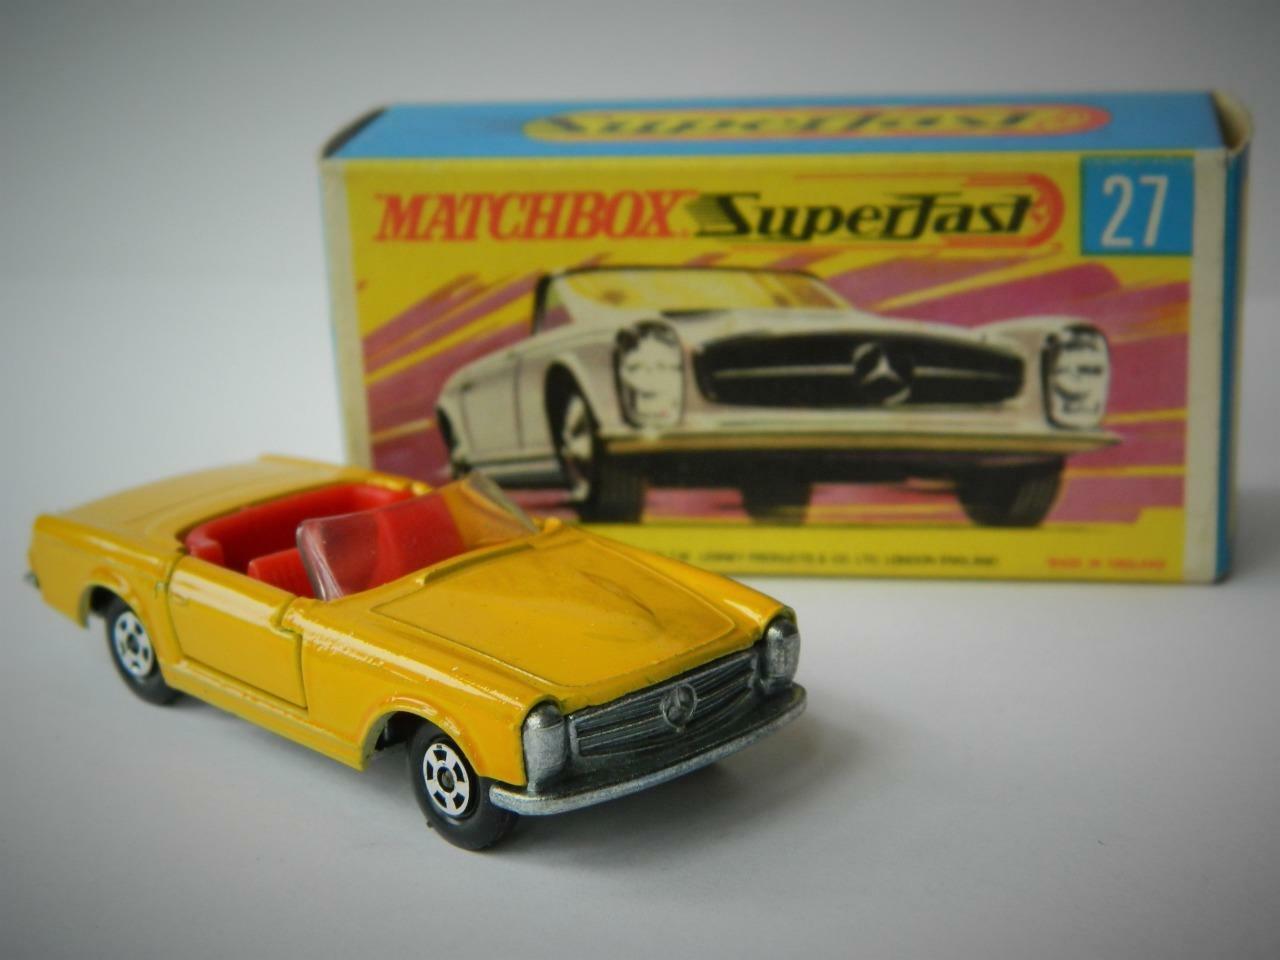 MATCHBOX LESNEY SUPERFAST 27 MERCEDES 230SL RARE RED INTERIOR MINT IN G2 BOX